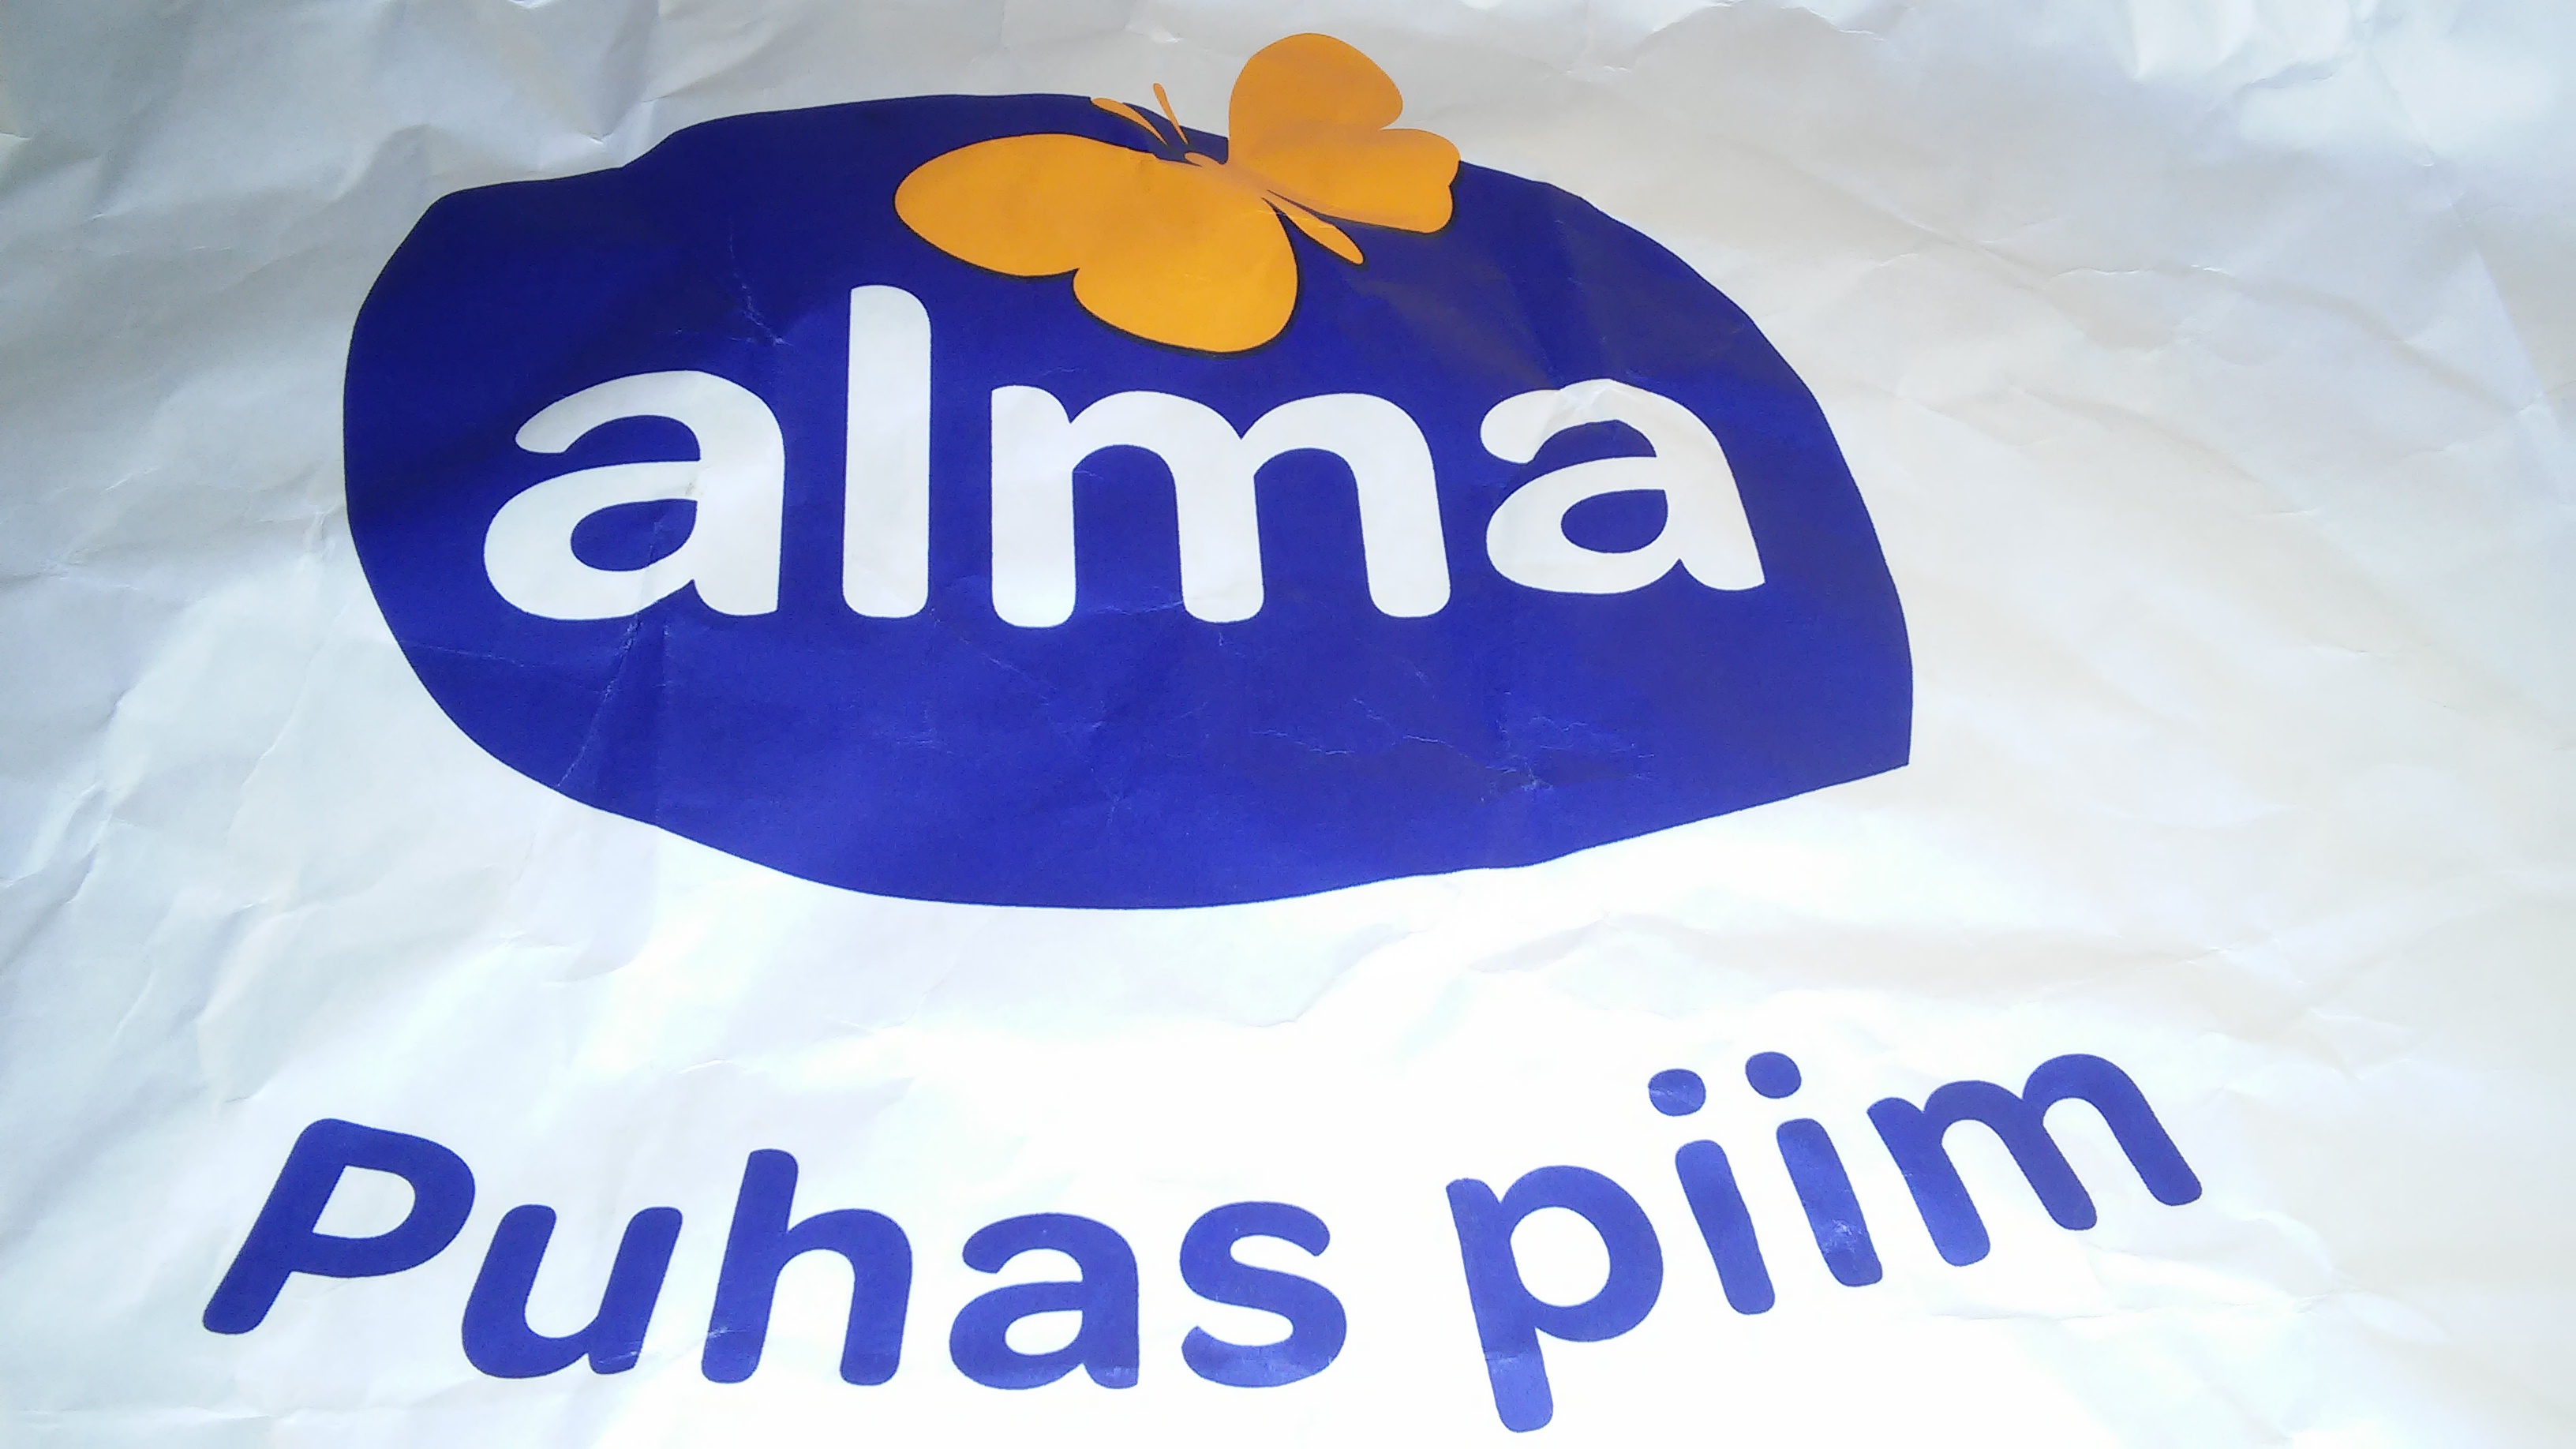 Tere Alma!